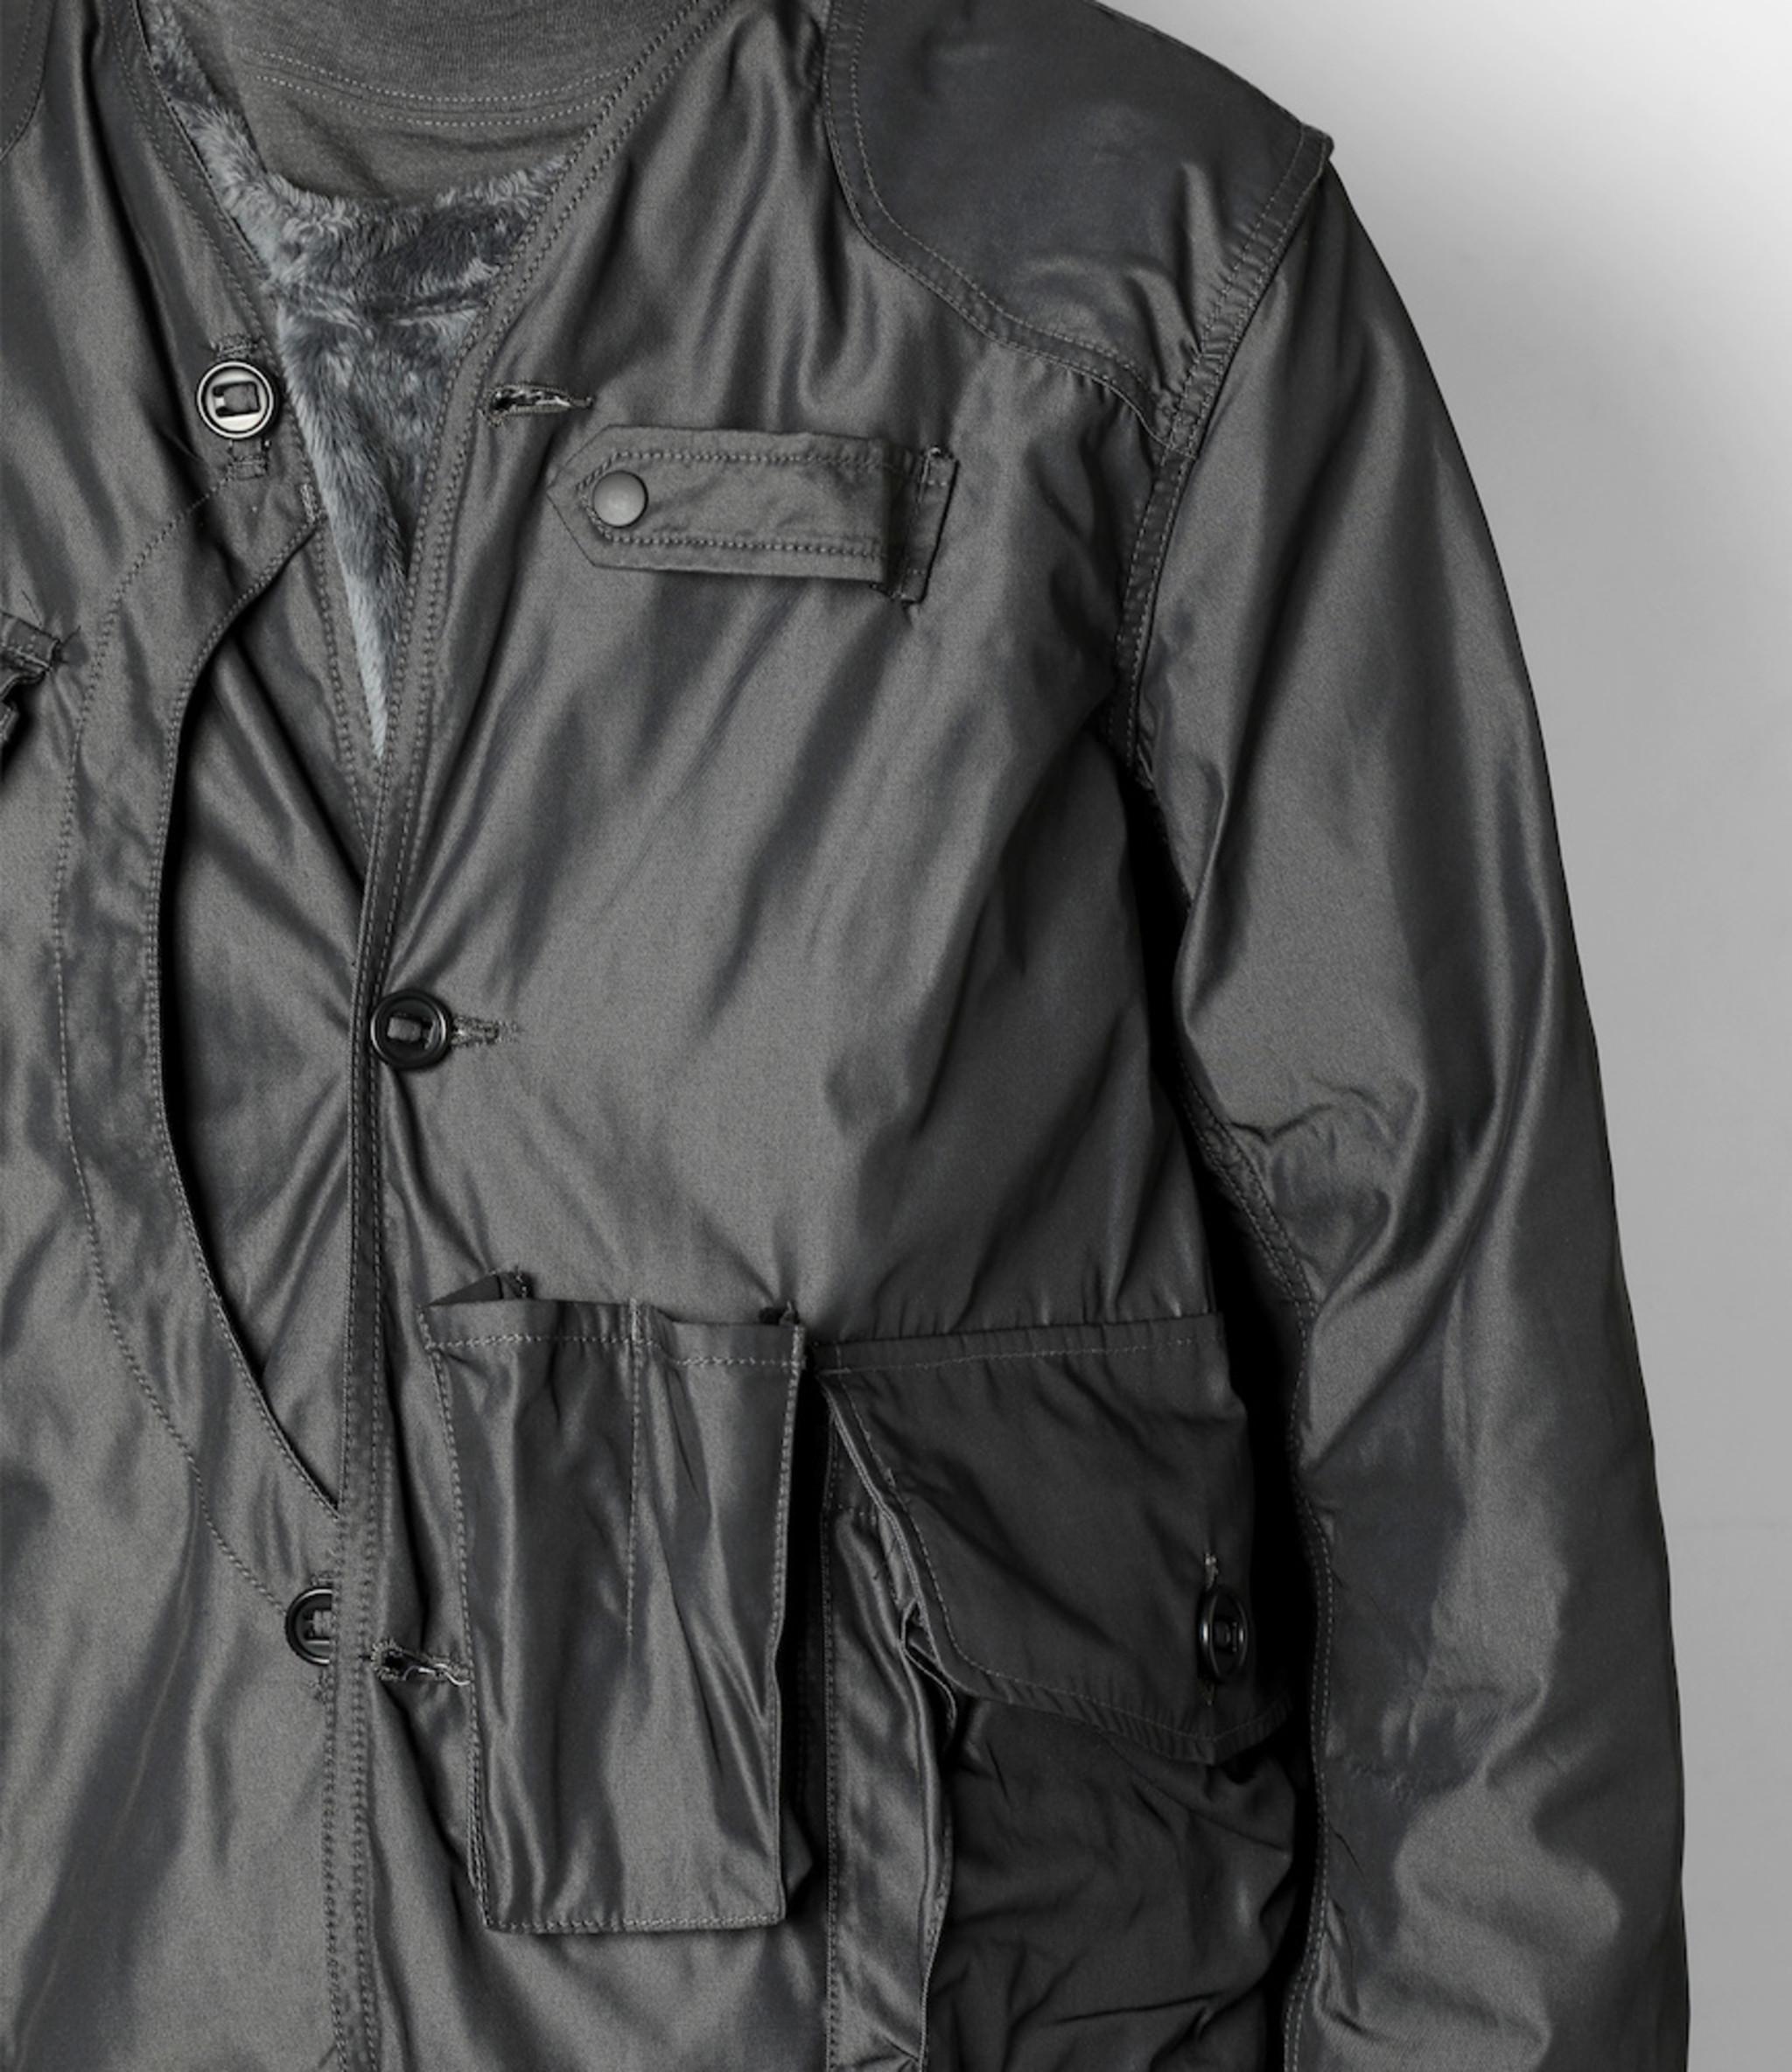 South2 West8 Tenkara Jacket Poly Gabardine - Charcoal